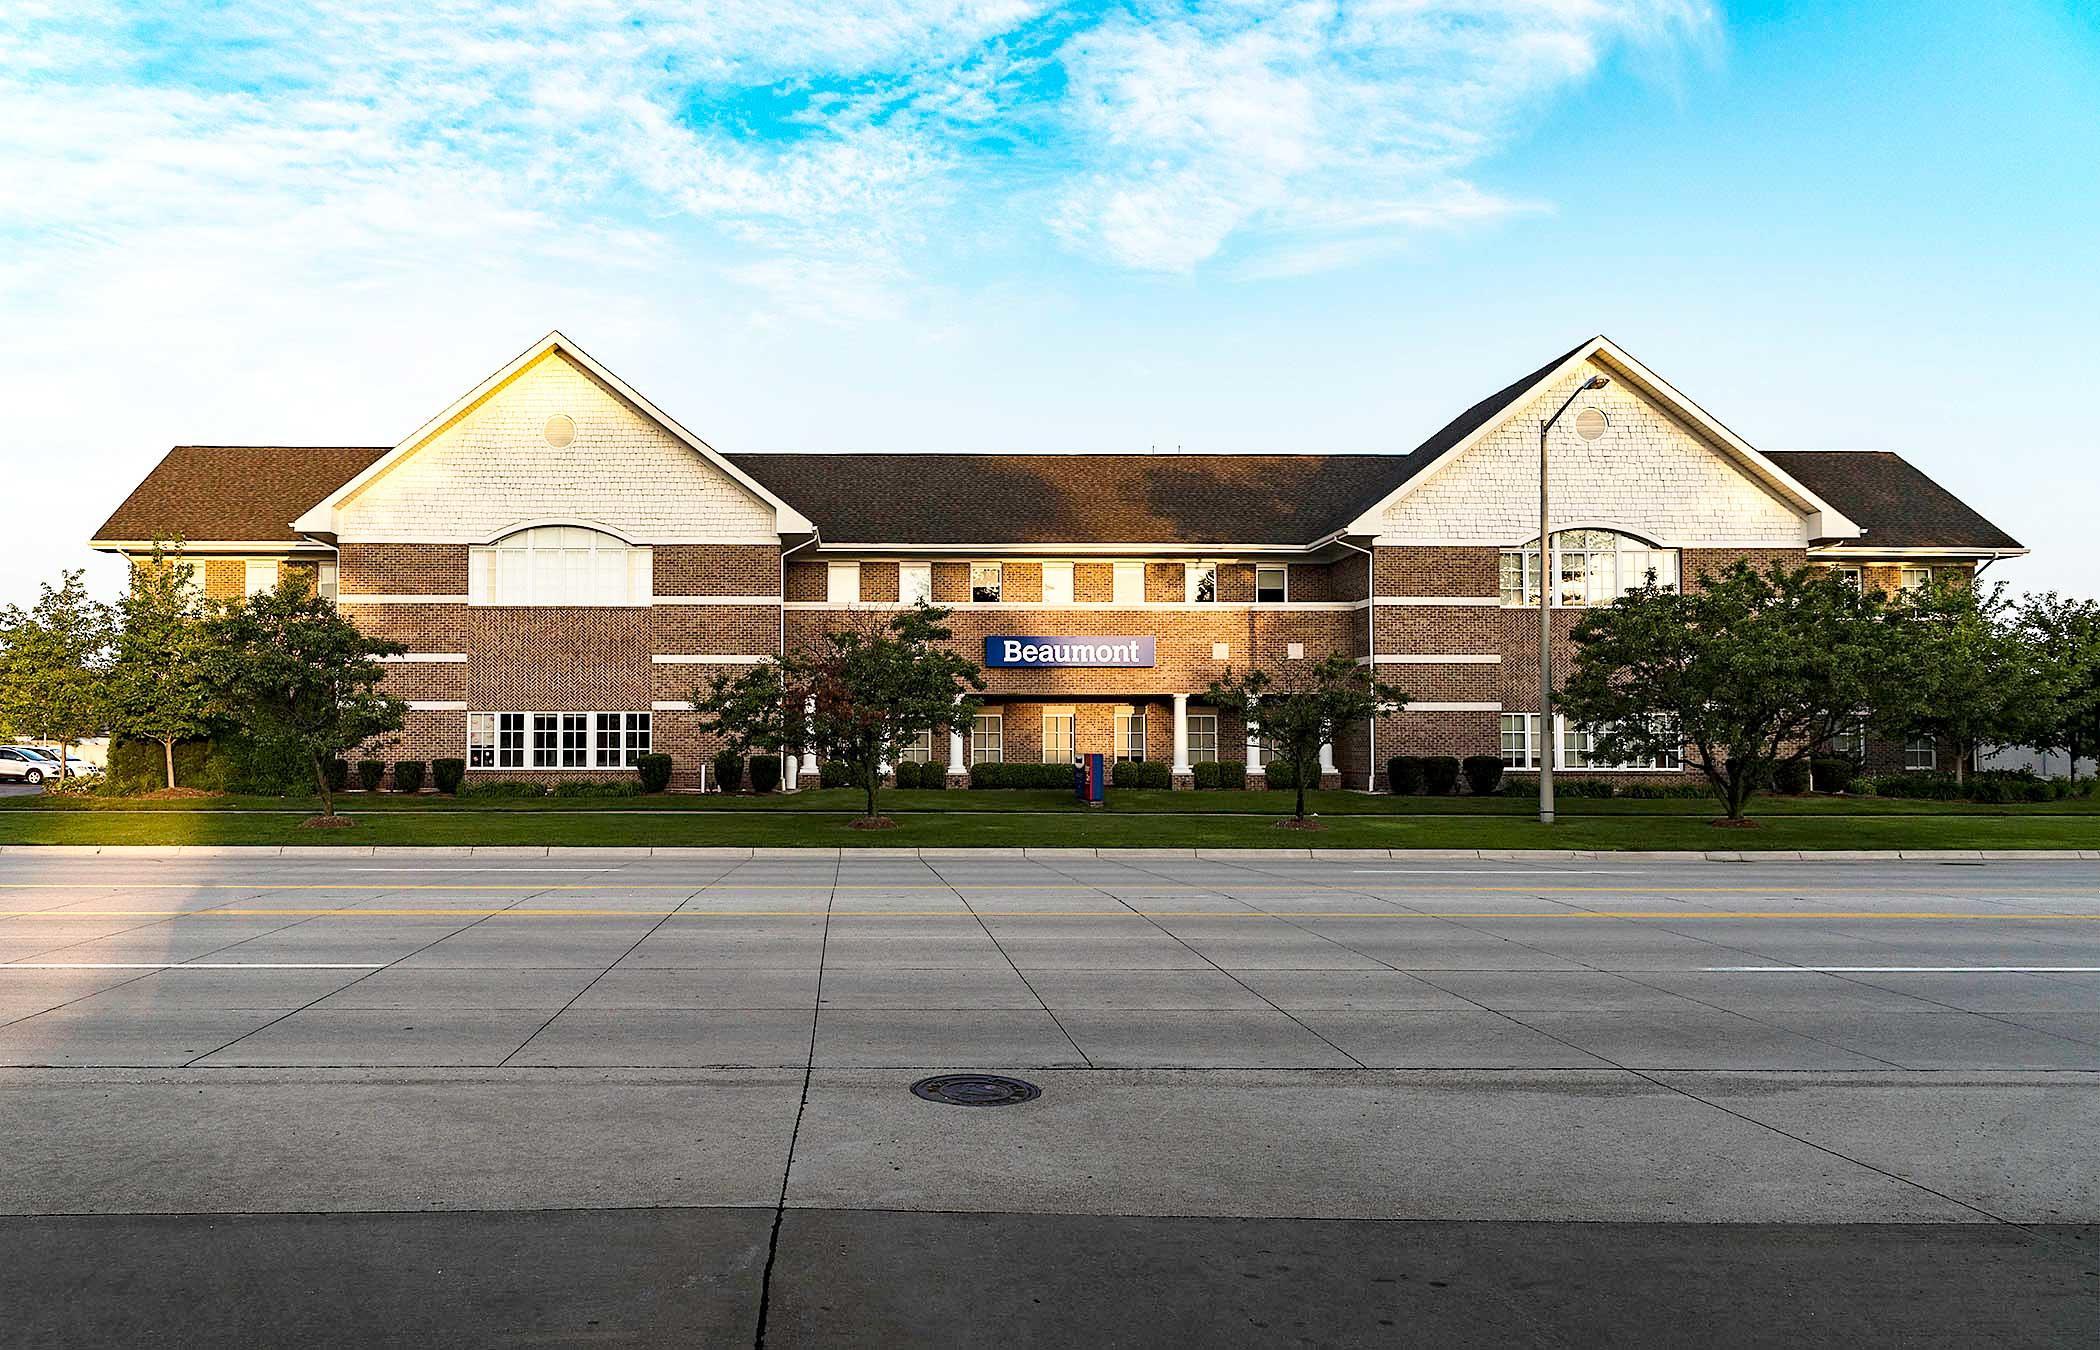 Beaumont Medical Center - St. Clair Shores image 1